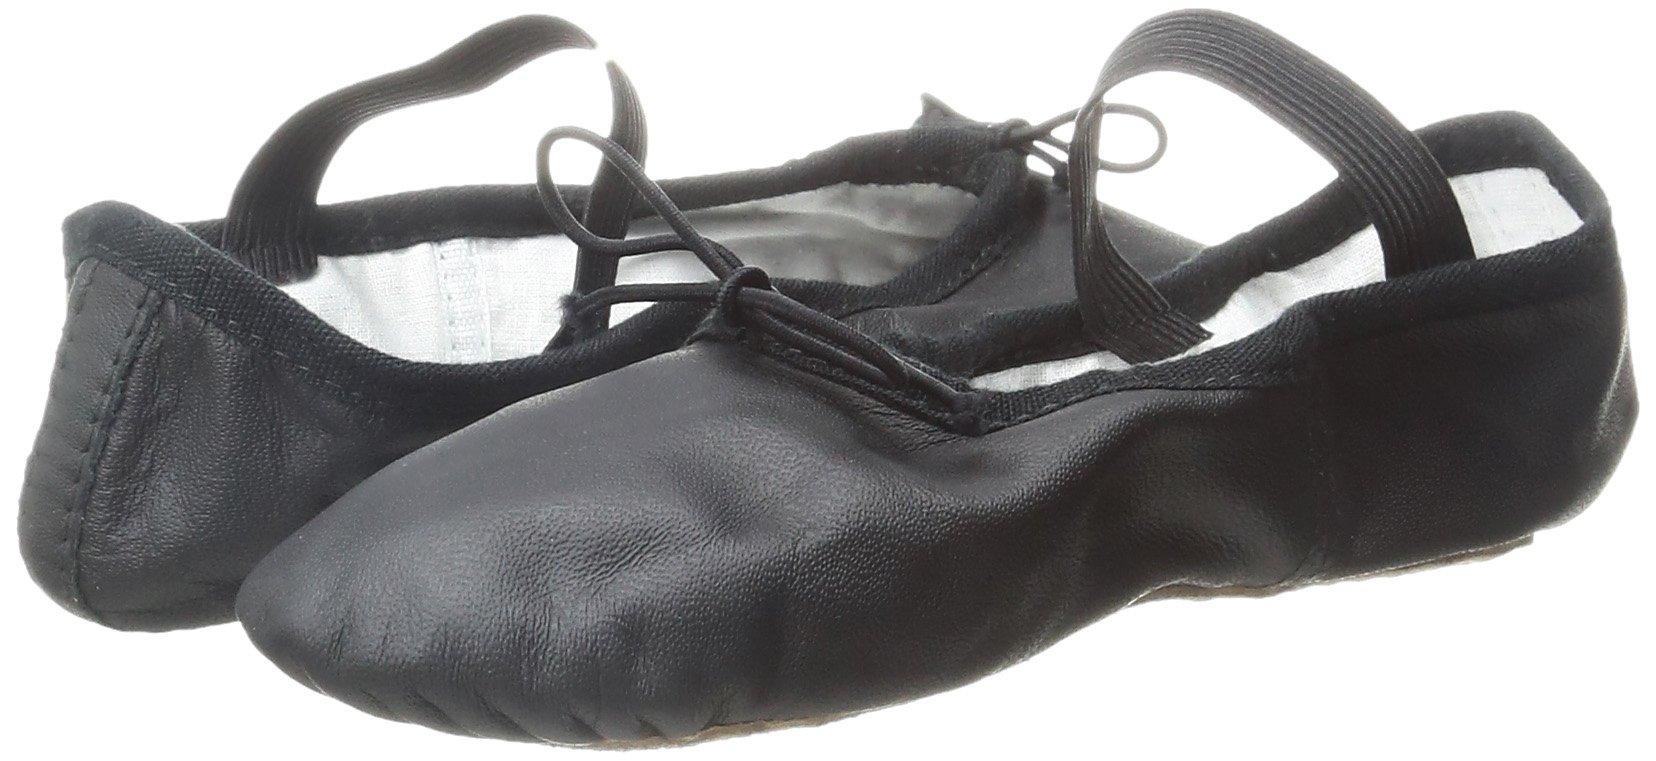 Bloch Dance Dansoft Ballet Slipper (Toddler/Little Kid),Black,7.5 C US Toddler by Bloch (Image #7)